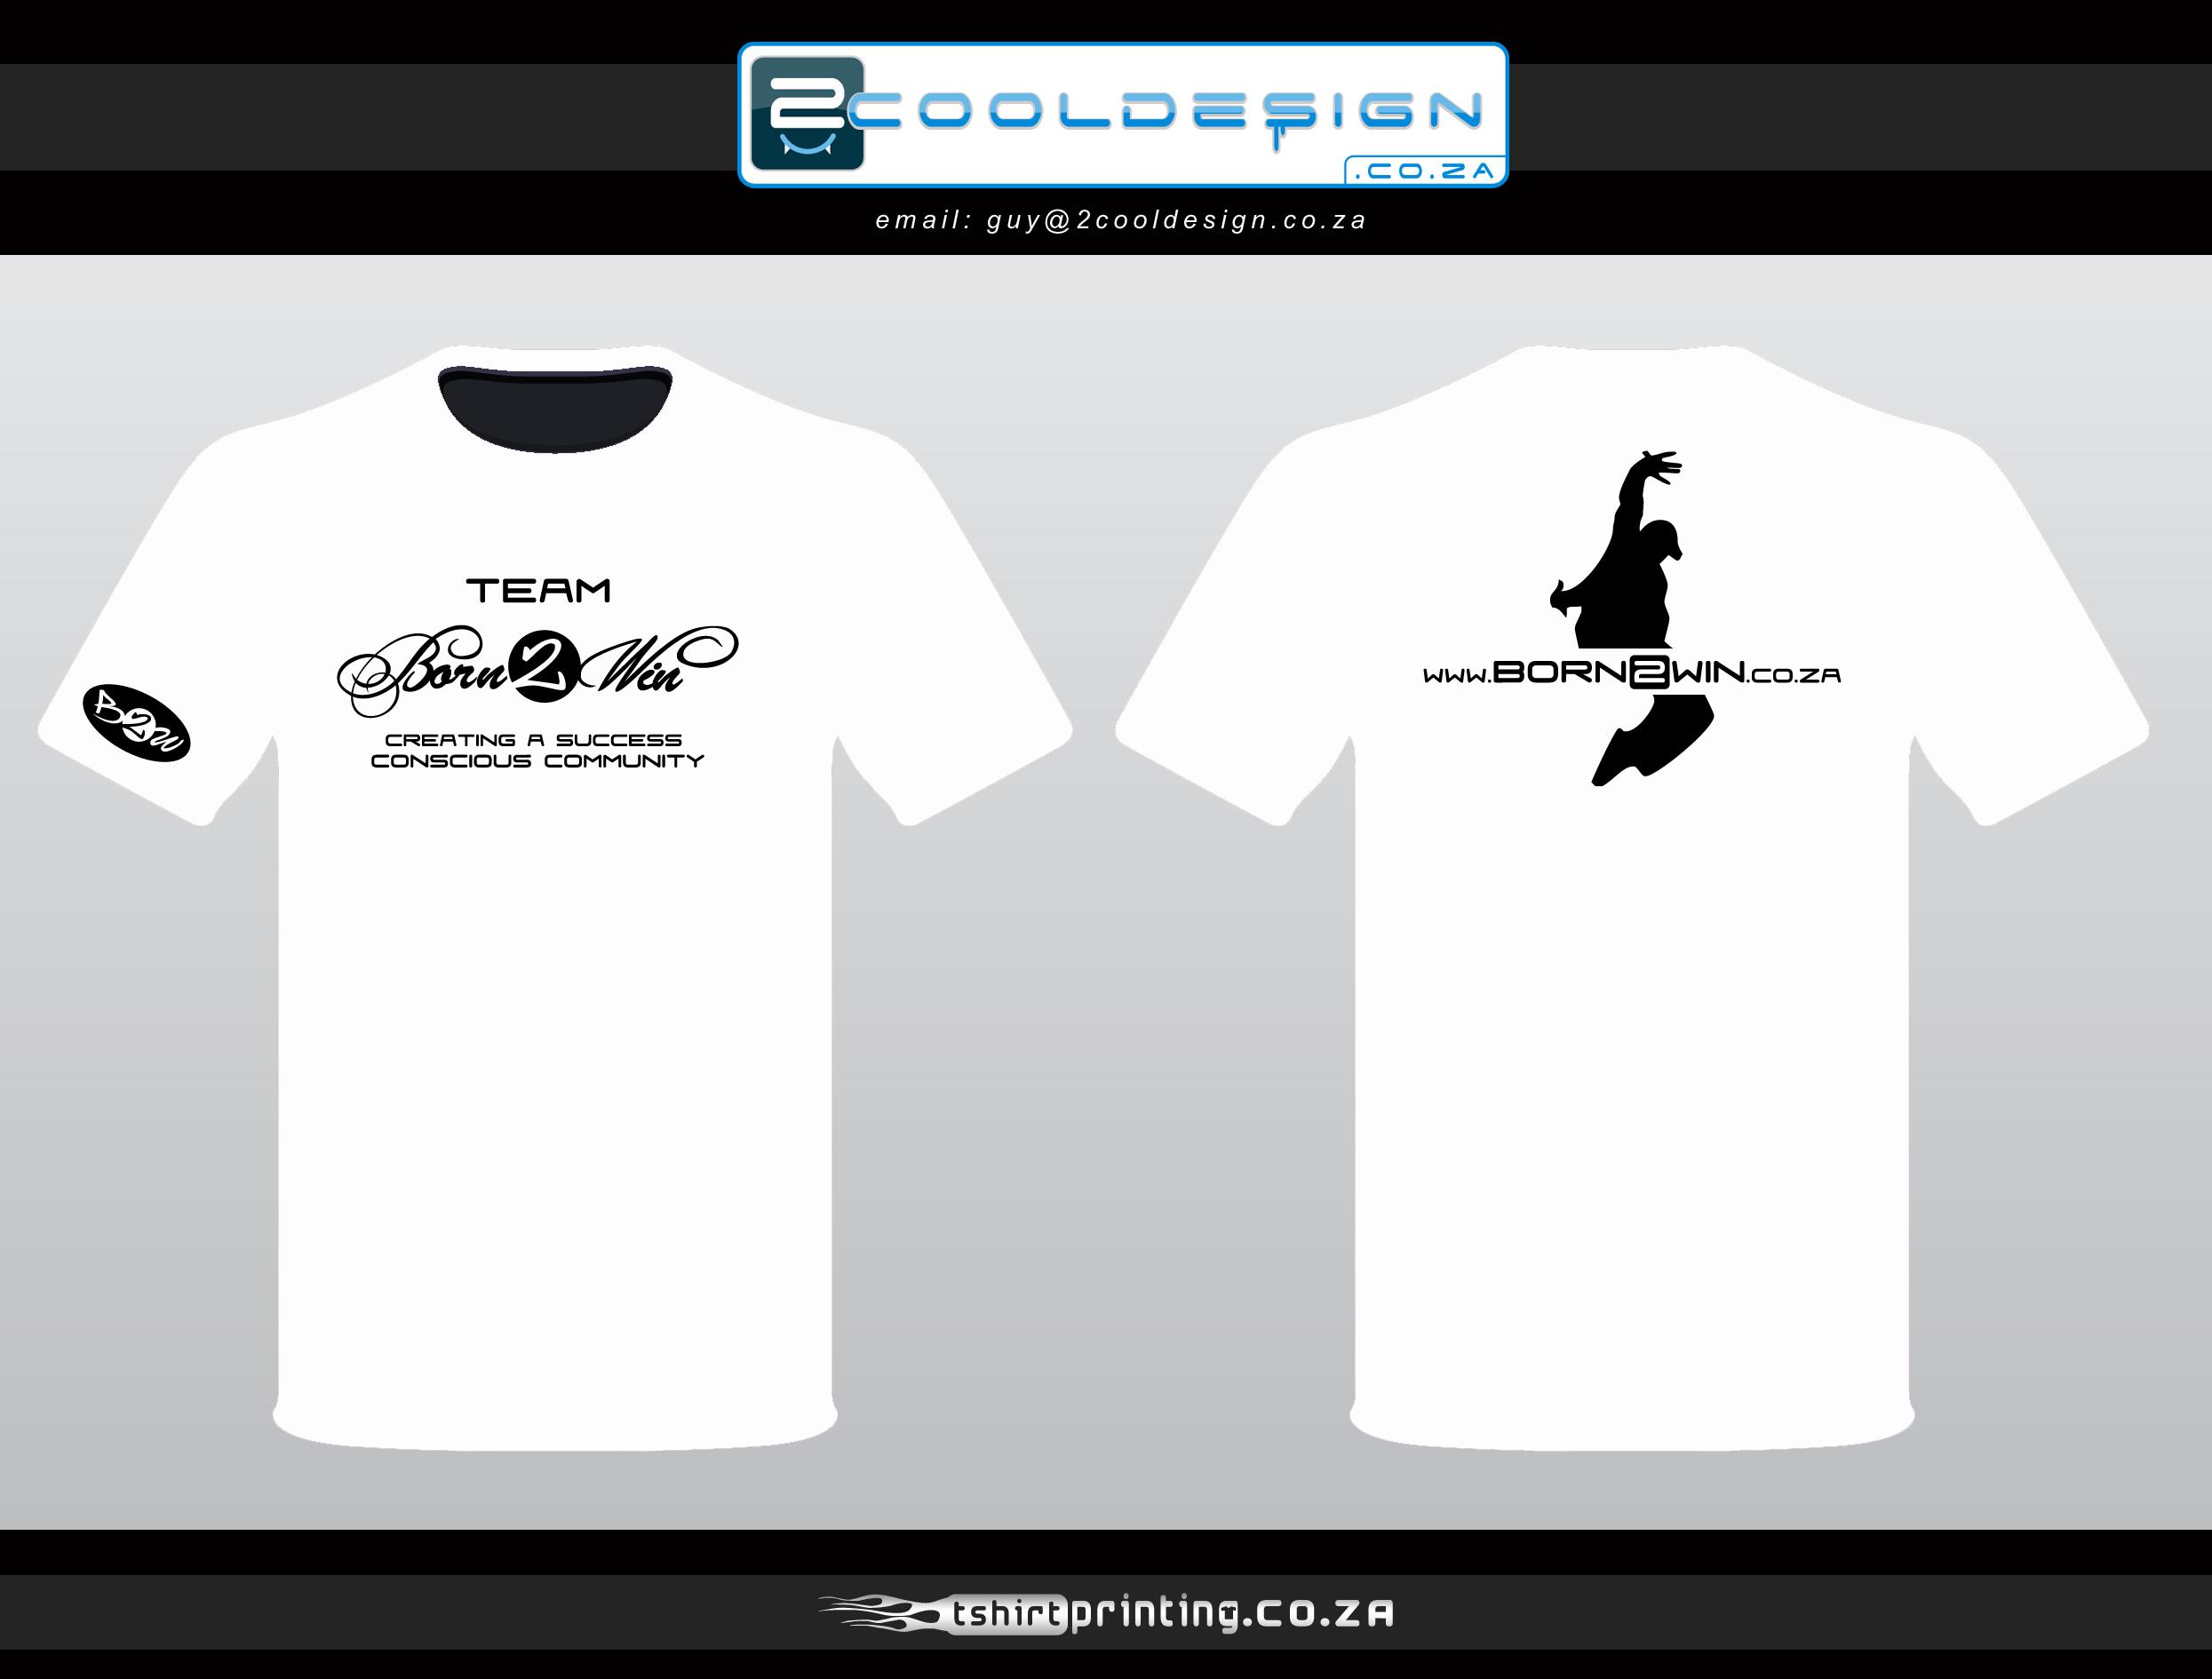 Design t shirts logo -  Logo Designfull Resolution 2490 1890